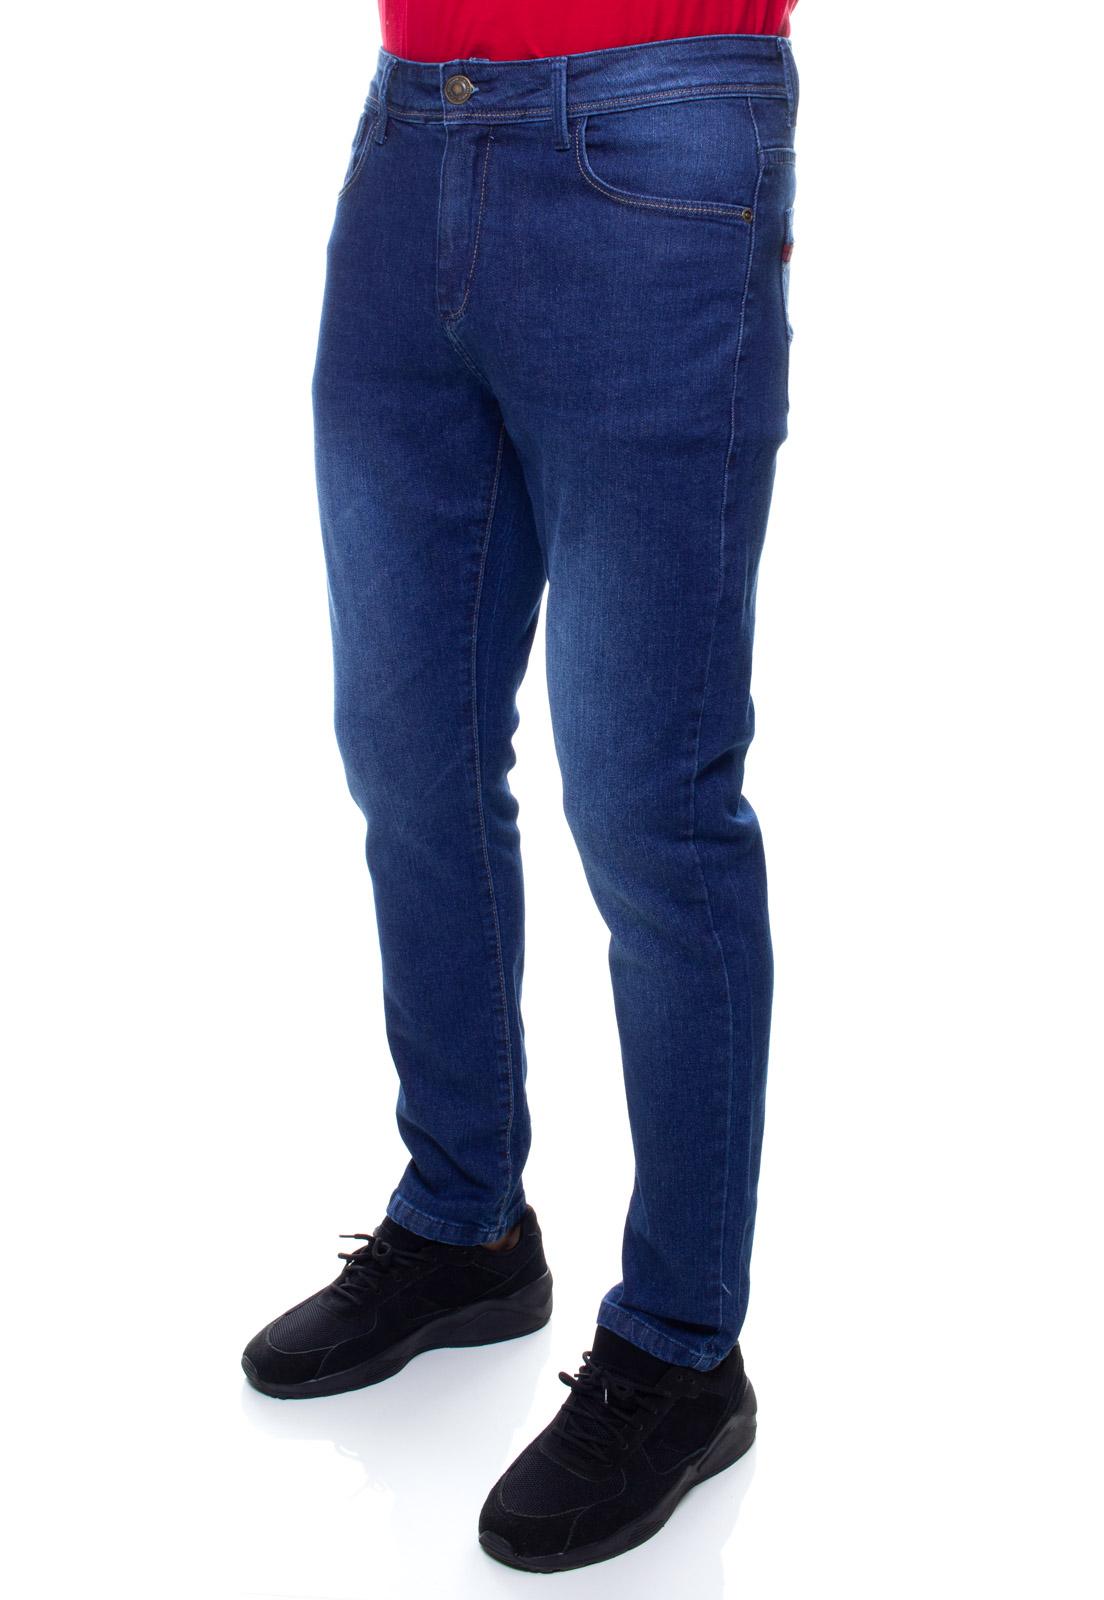 Calça Confort Jeans Masculina Crocker - 48109  - CROCKER JEANS